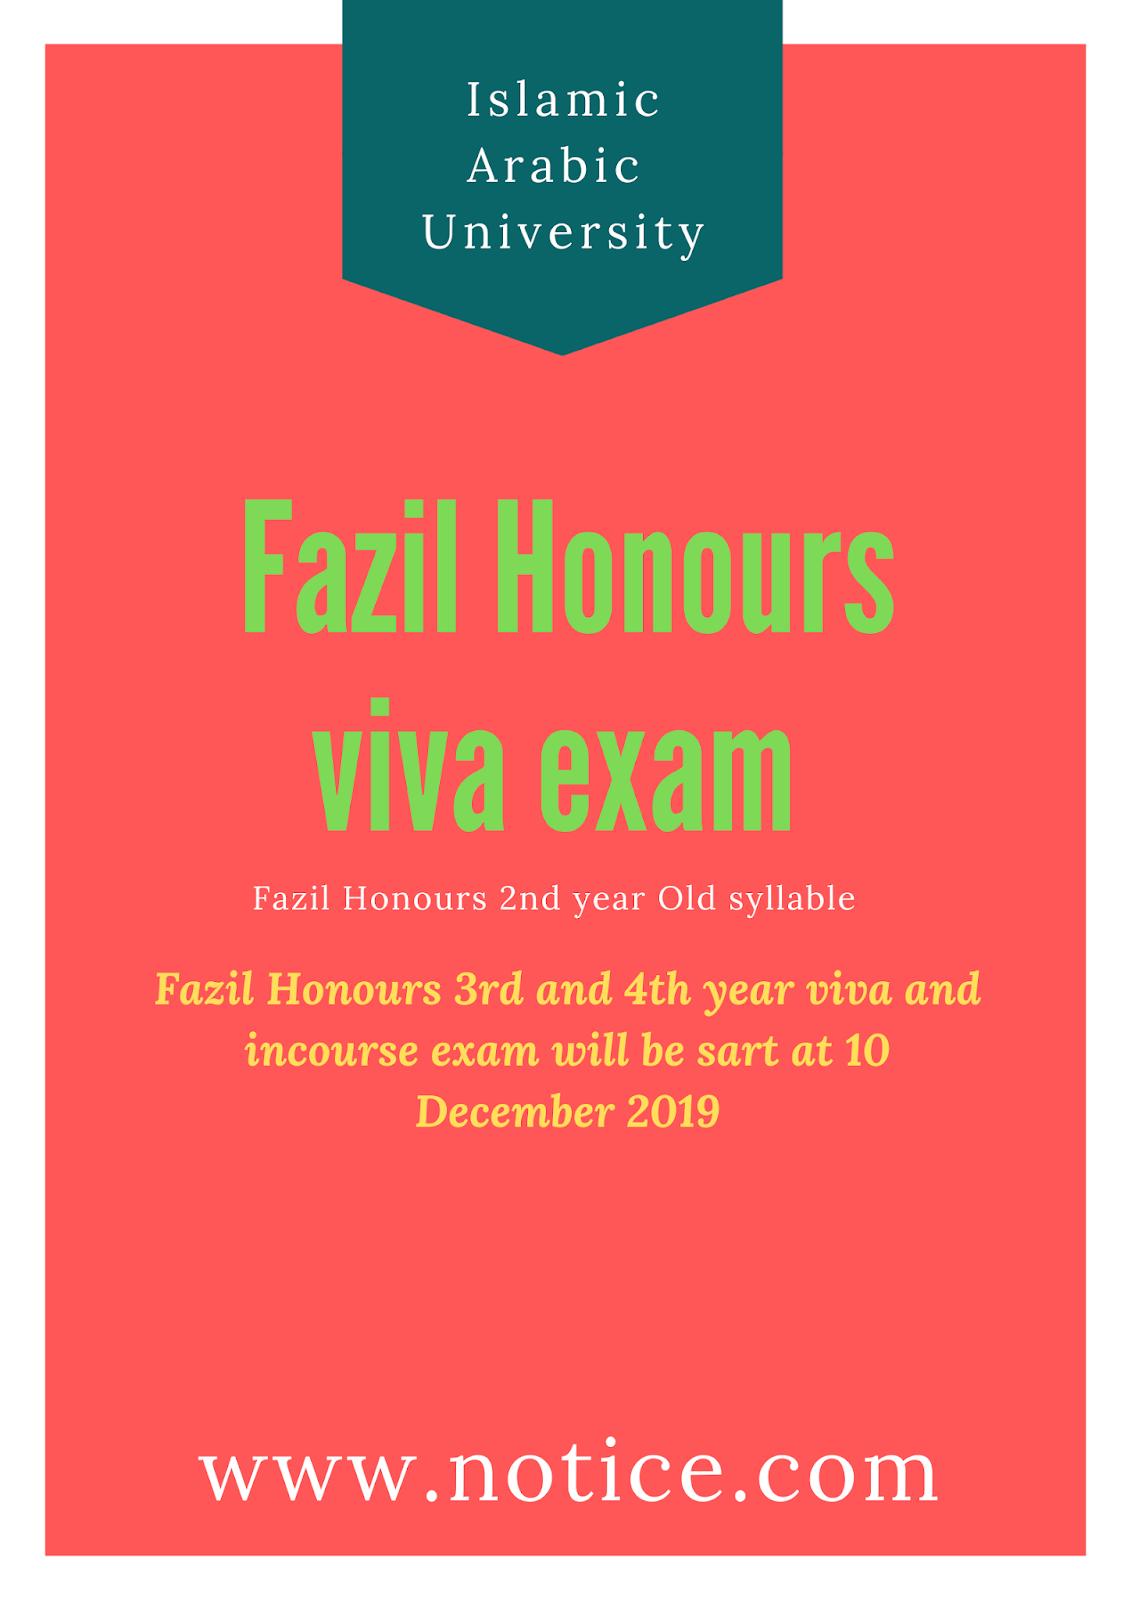 Infographic of fazil viva exam